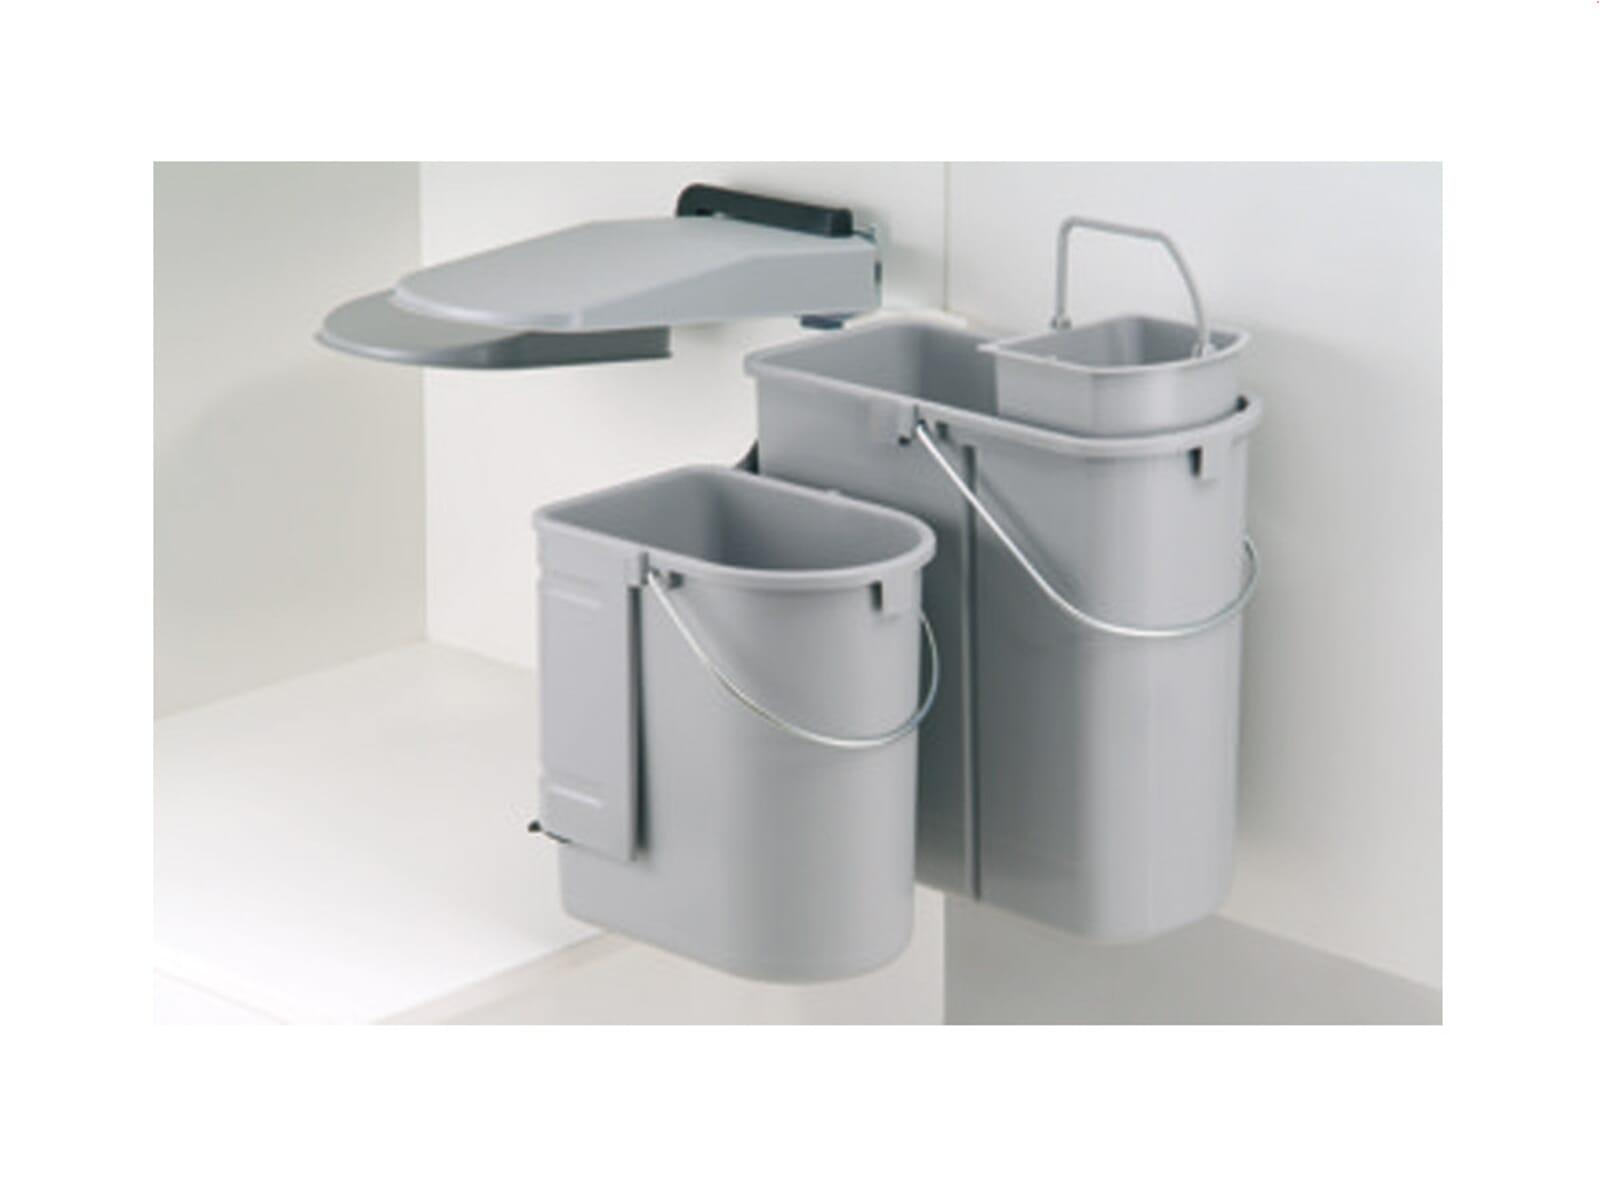 wesco kotainer 703661 85 einbau abfallsammler. Black Bedroom Furniture Sets. Home Design Ideas